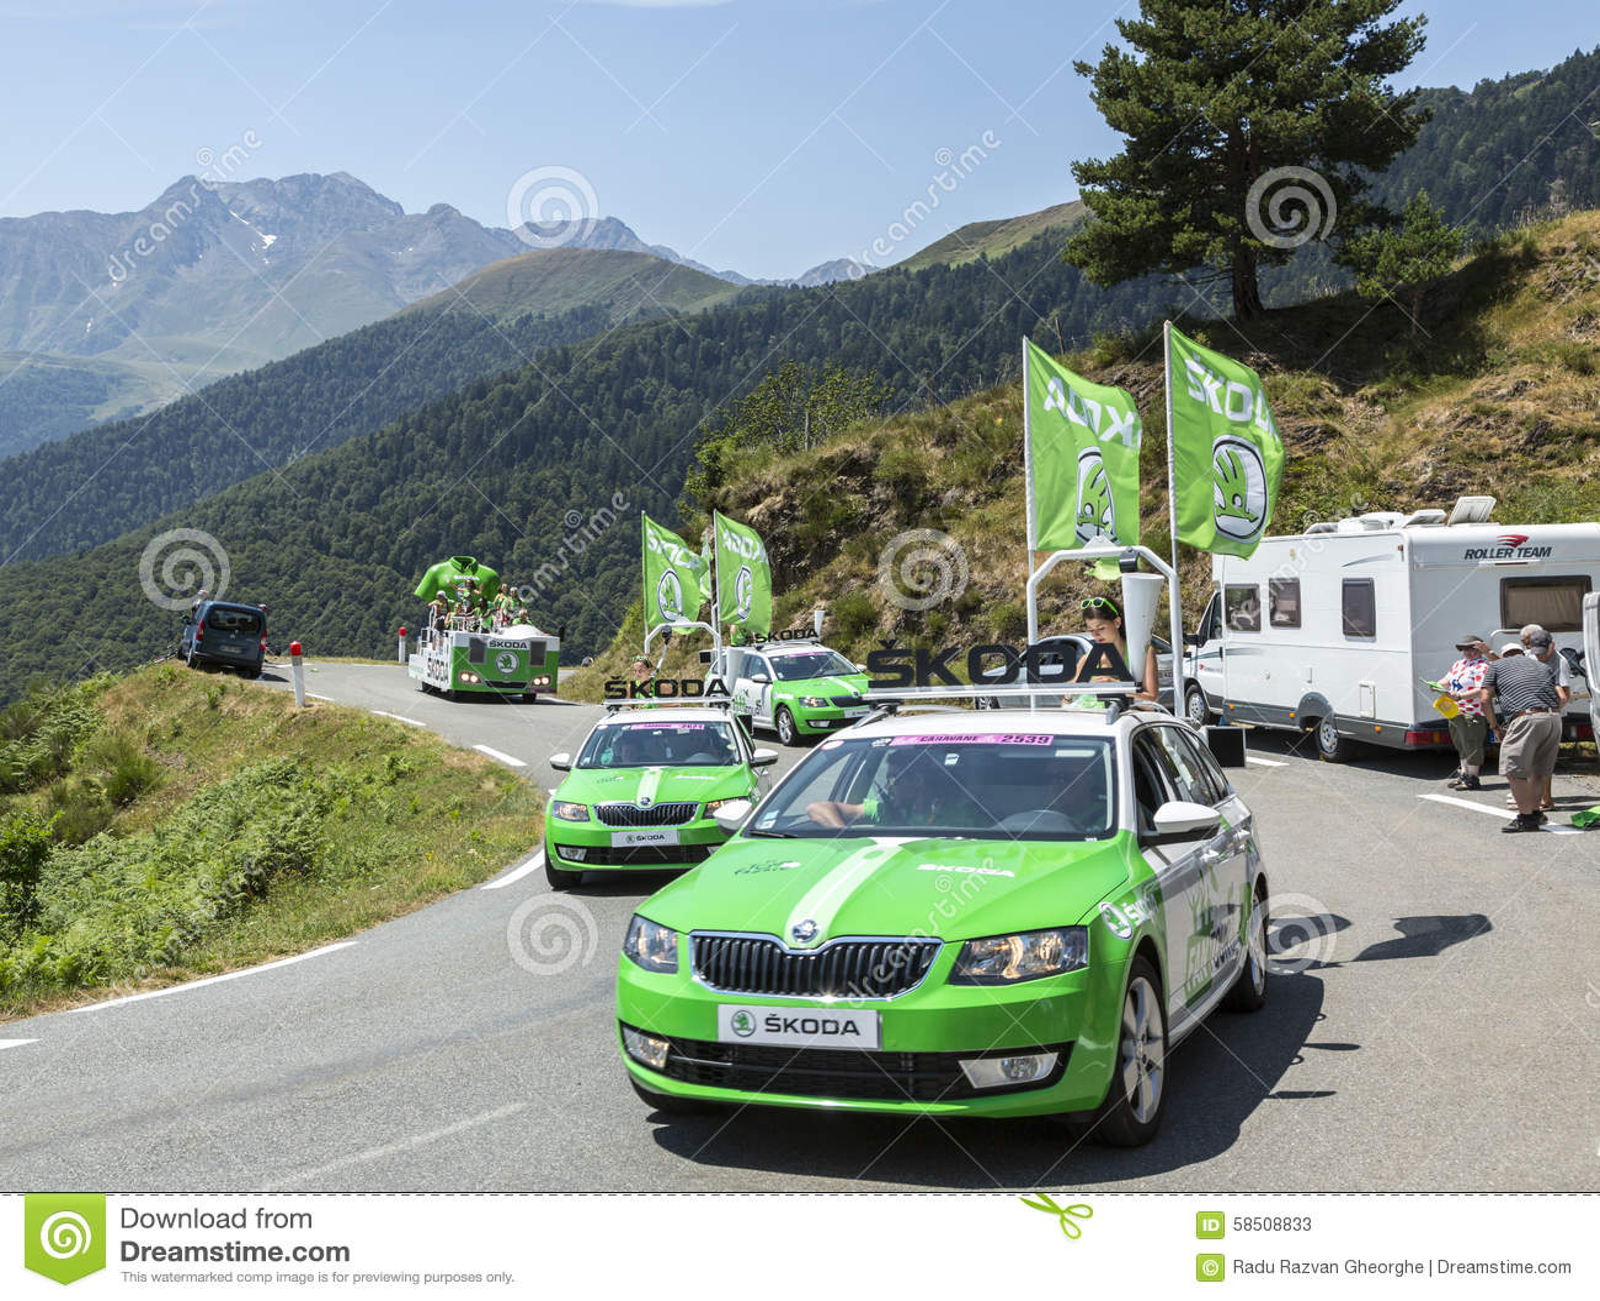 skoda caravan in pyrenees mountains tour de france 2015 editorial stock photo image 58508833. Black Bedroom Furniture Sets. Home Design Ideas